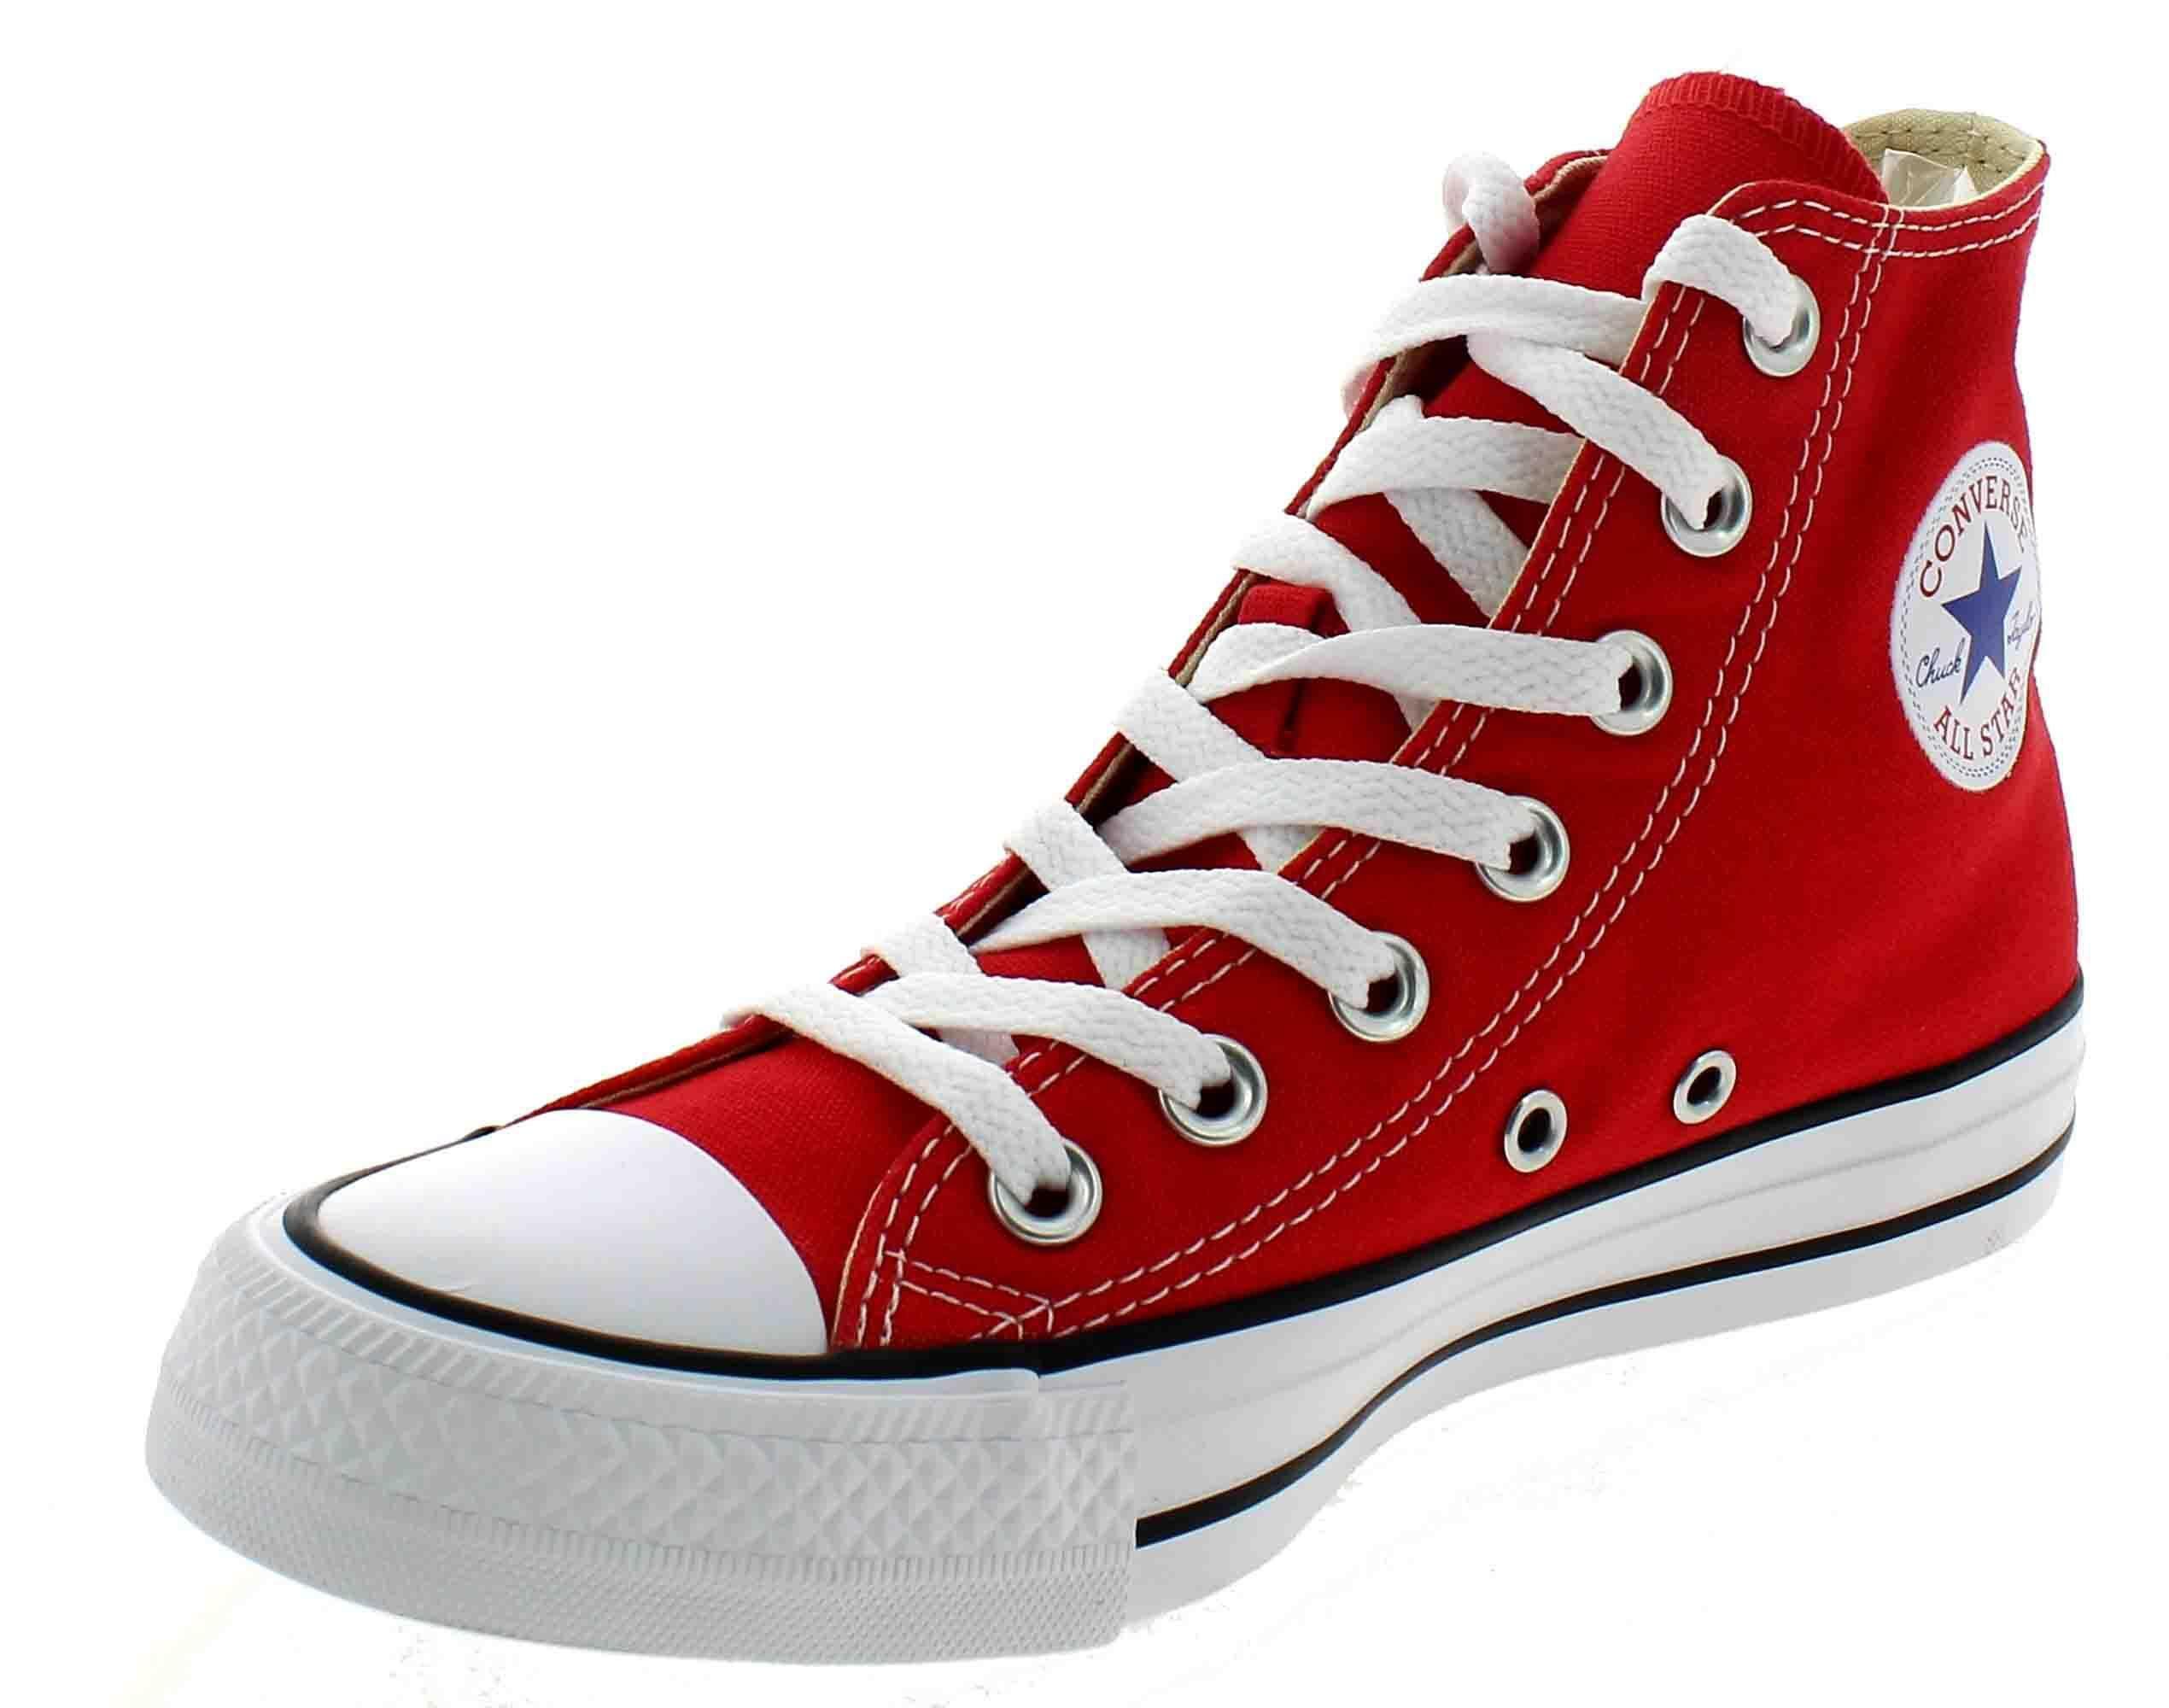 1b60f7ce165d Converse Chuck Taylor All Star Hi Men s Trainer Chucks Ankle High ...